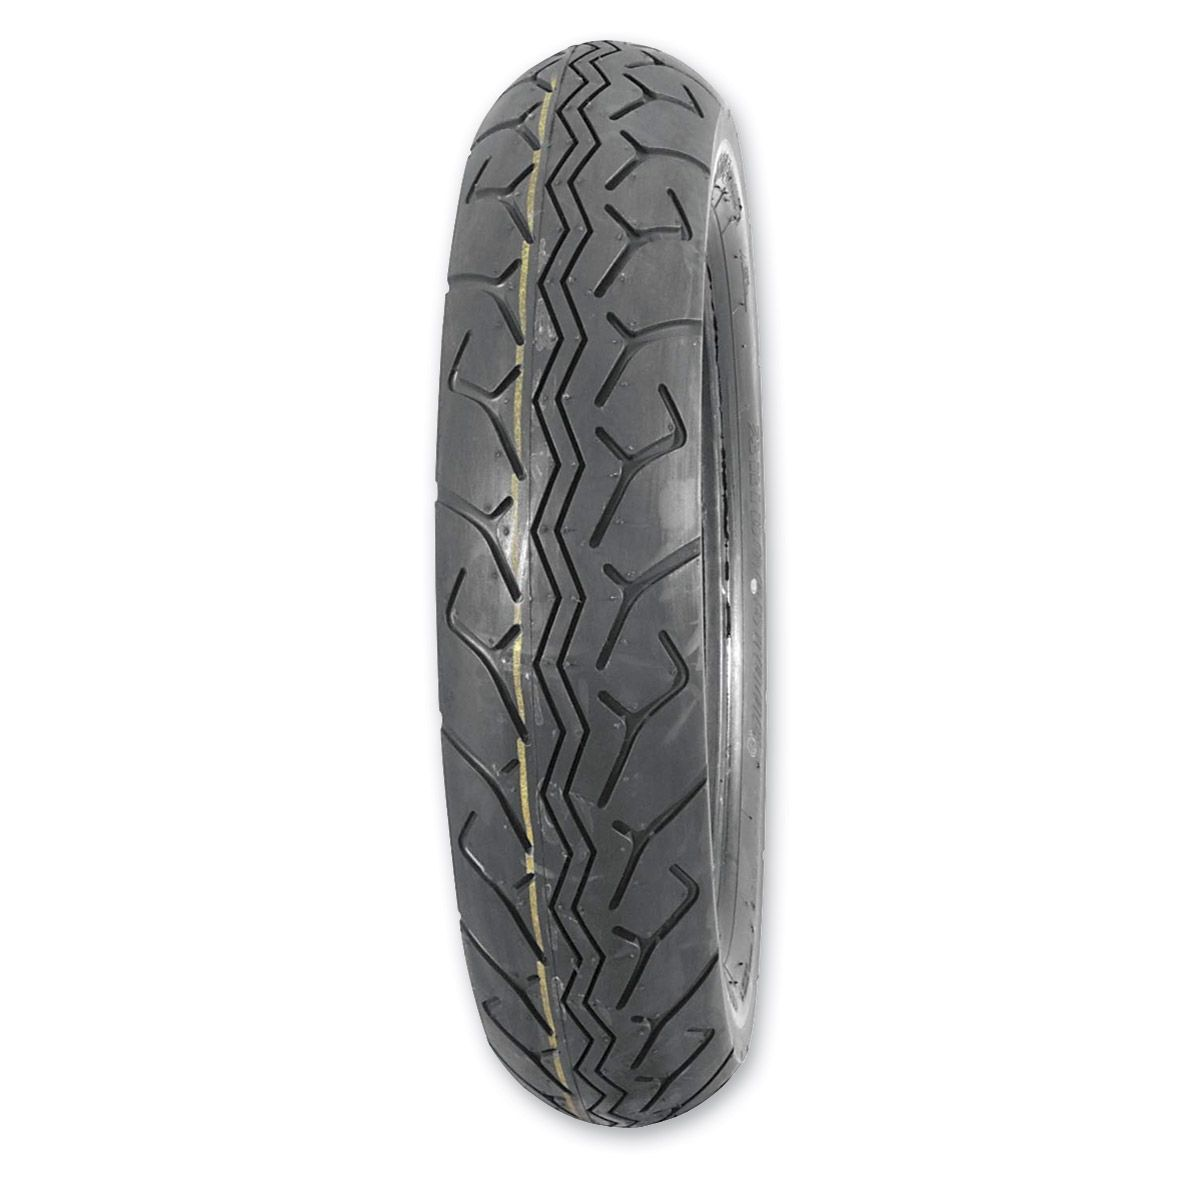 001675 130/90--16 Exedra G703 (Front) Bridgestone